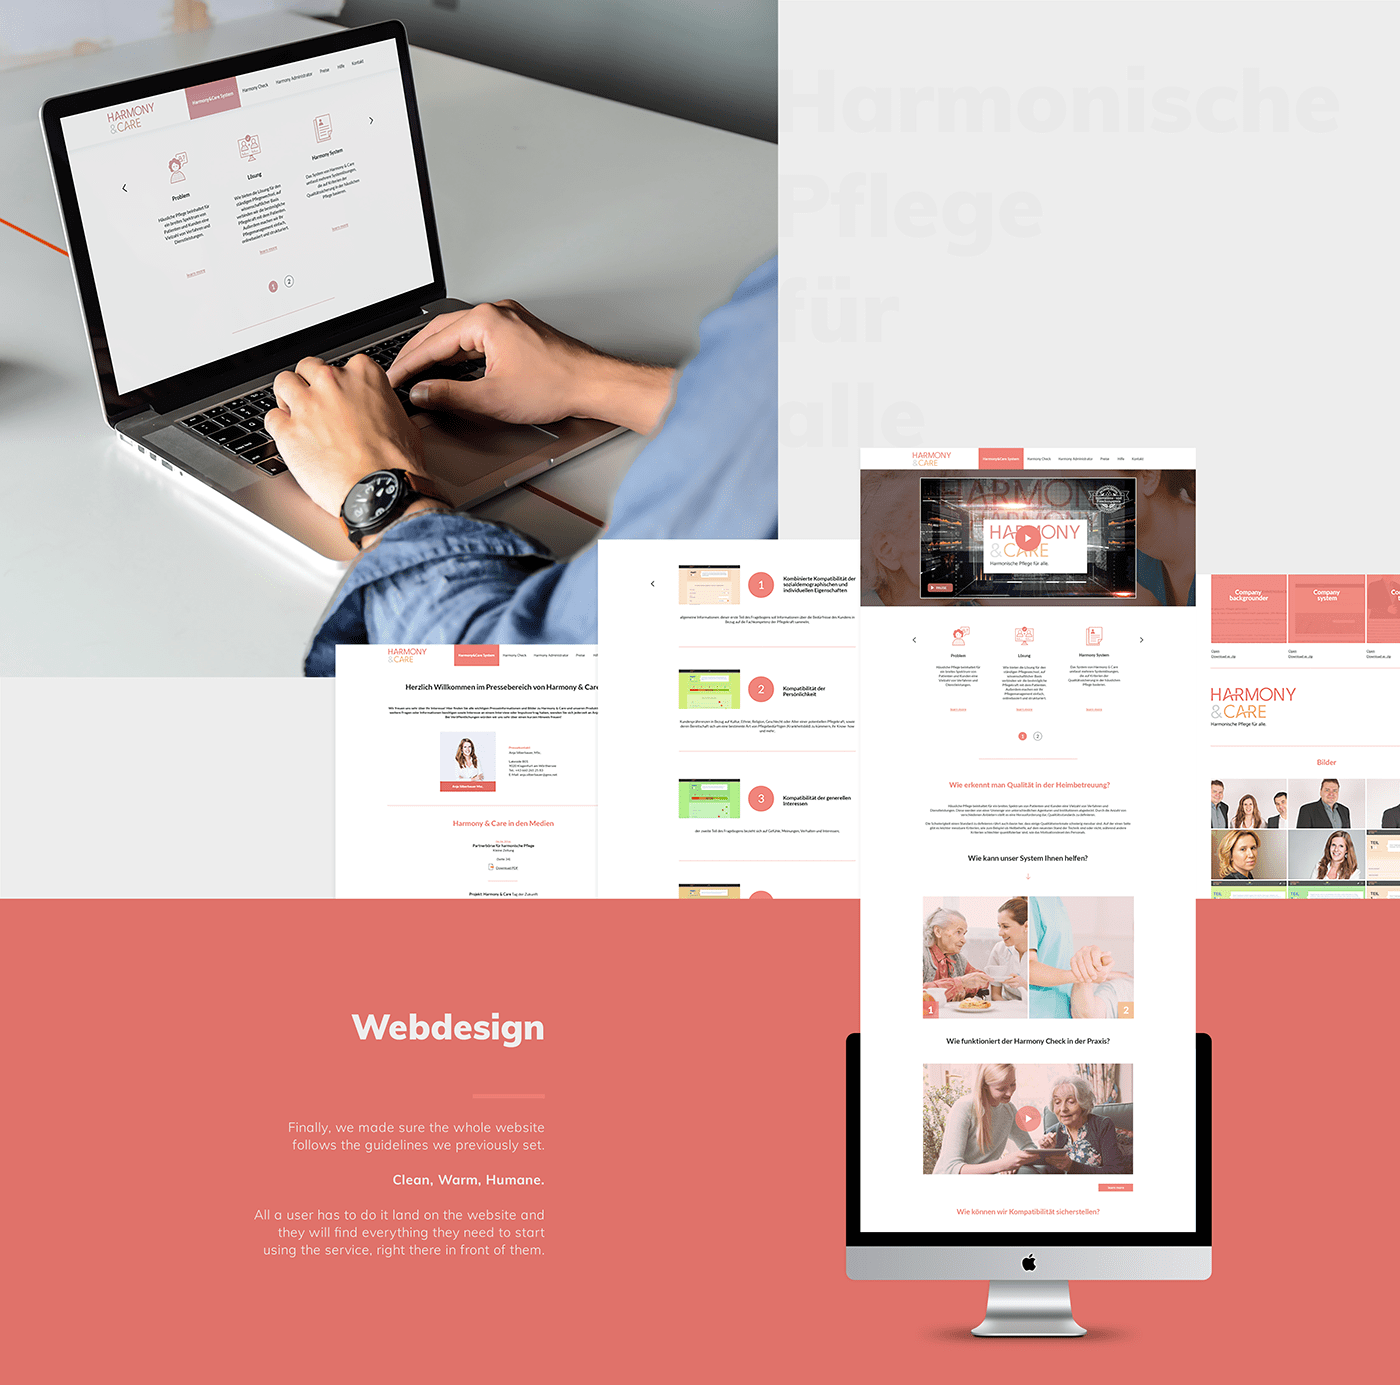 Webdesign Creative Direction  visual identity Startup Case Study icon design  print material Logo Design app ui design